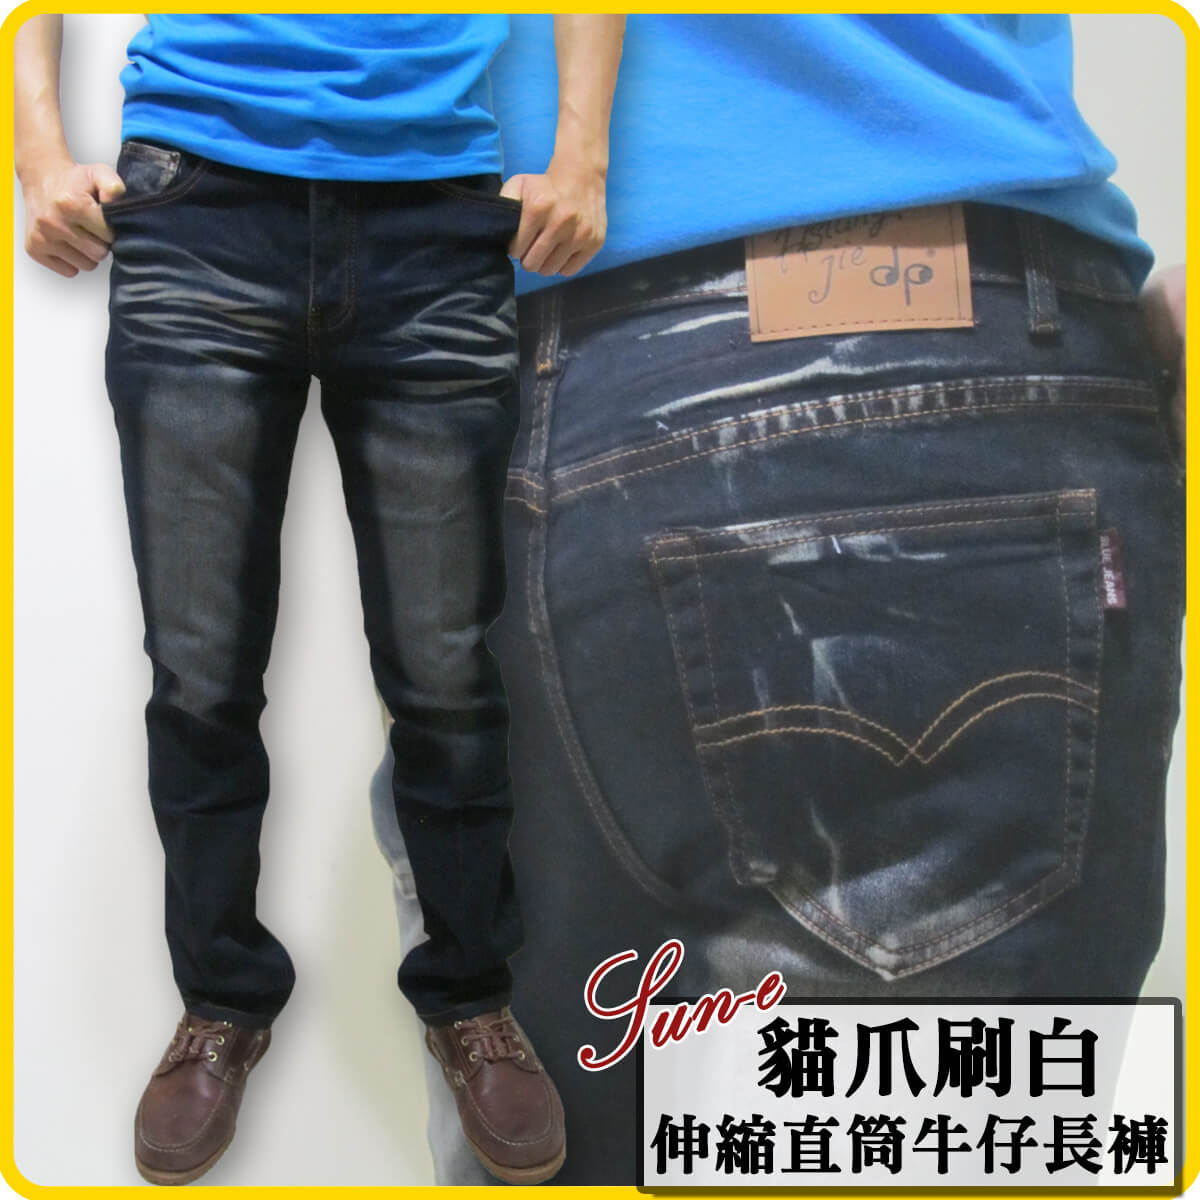 sun-e貓爪刷白牛仔褲、伸縮直筒修身牛仔長褲、顯瘦丹寧長褲、彈力牛仔長褲(307-7013-21)黑 腰圍:M L XL 2L 3L 4L(28~39英吋) 0